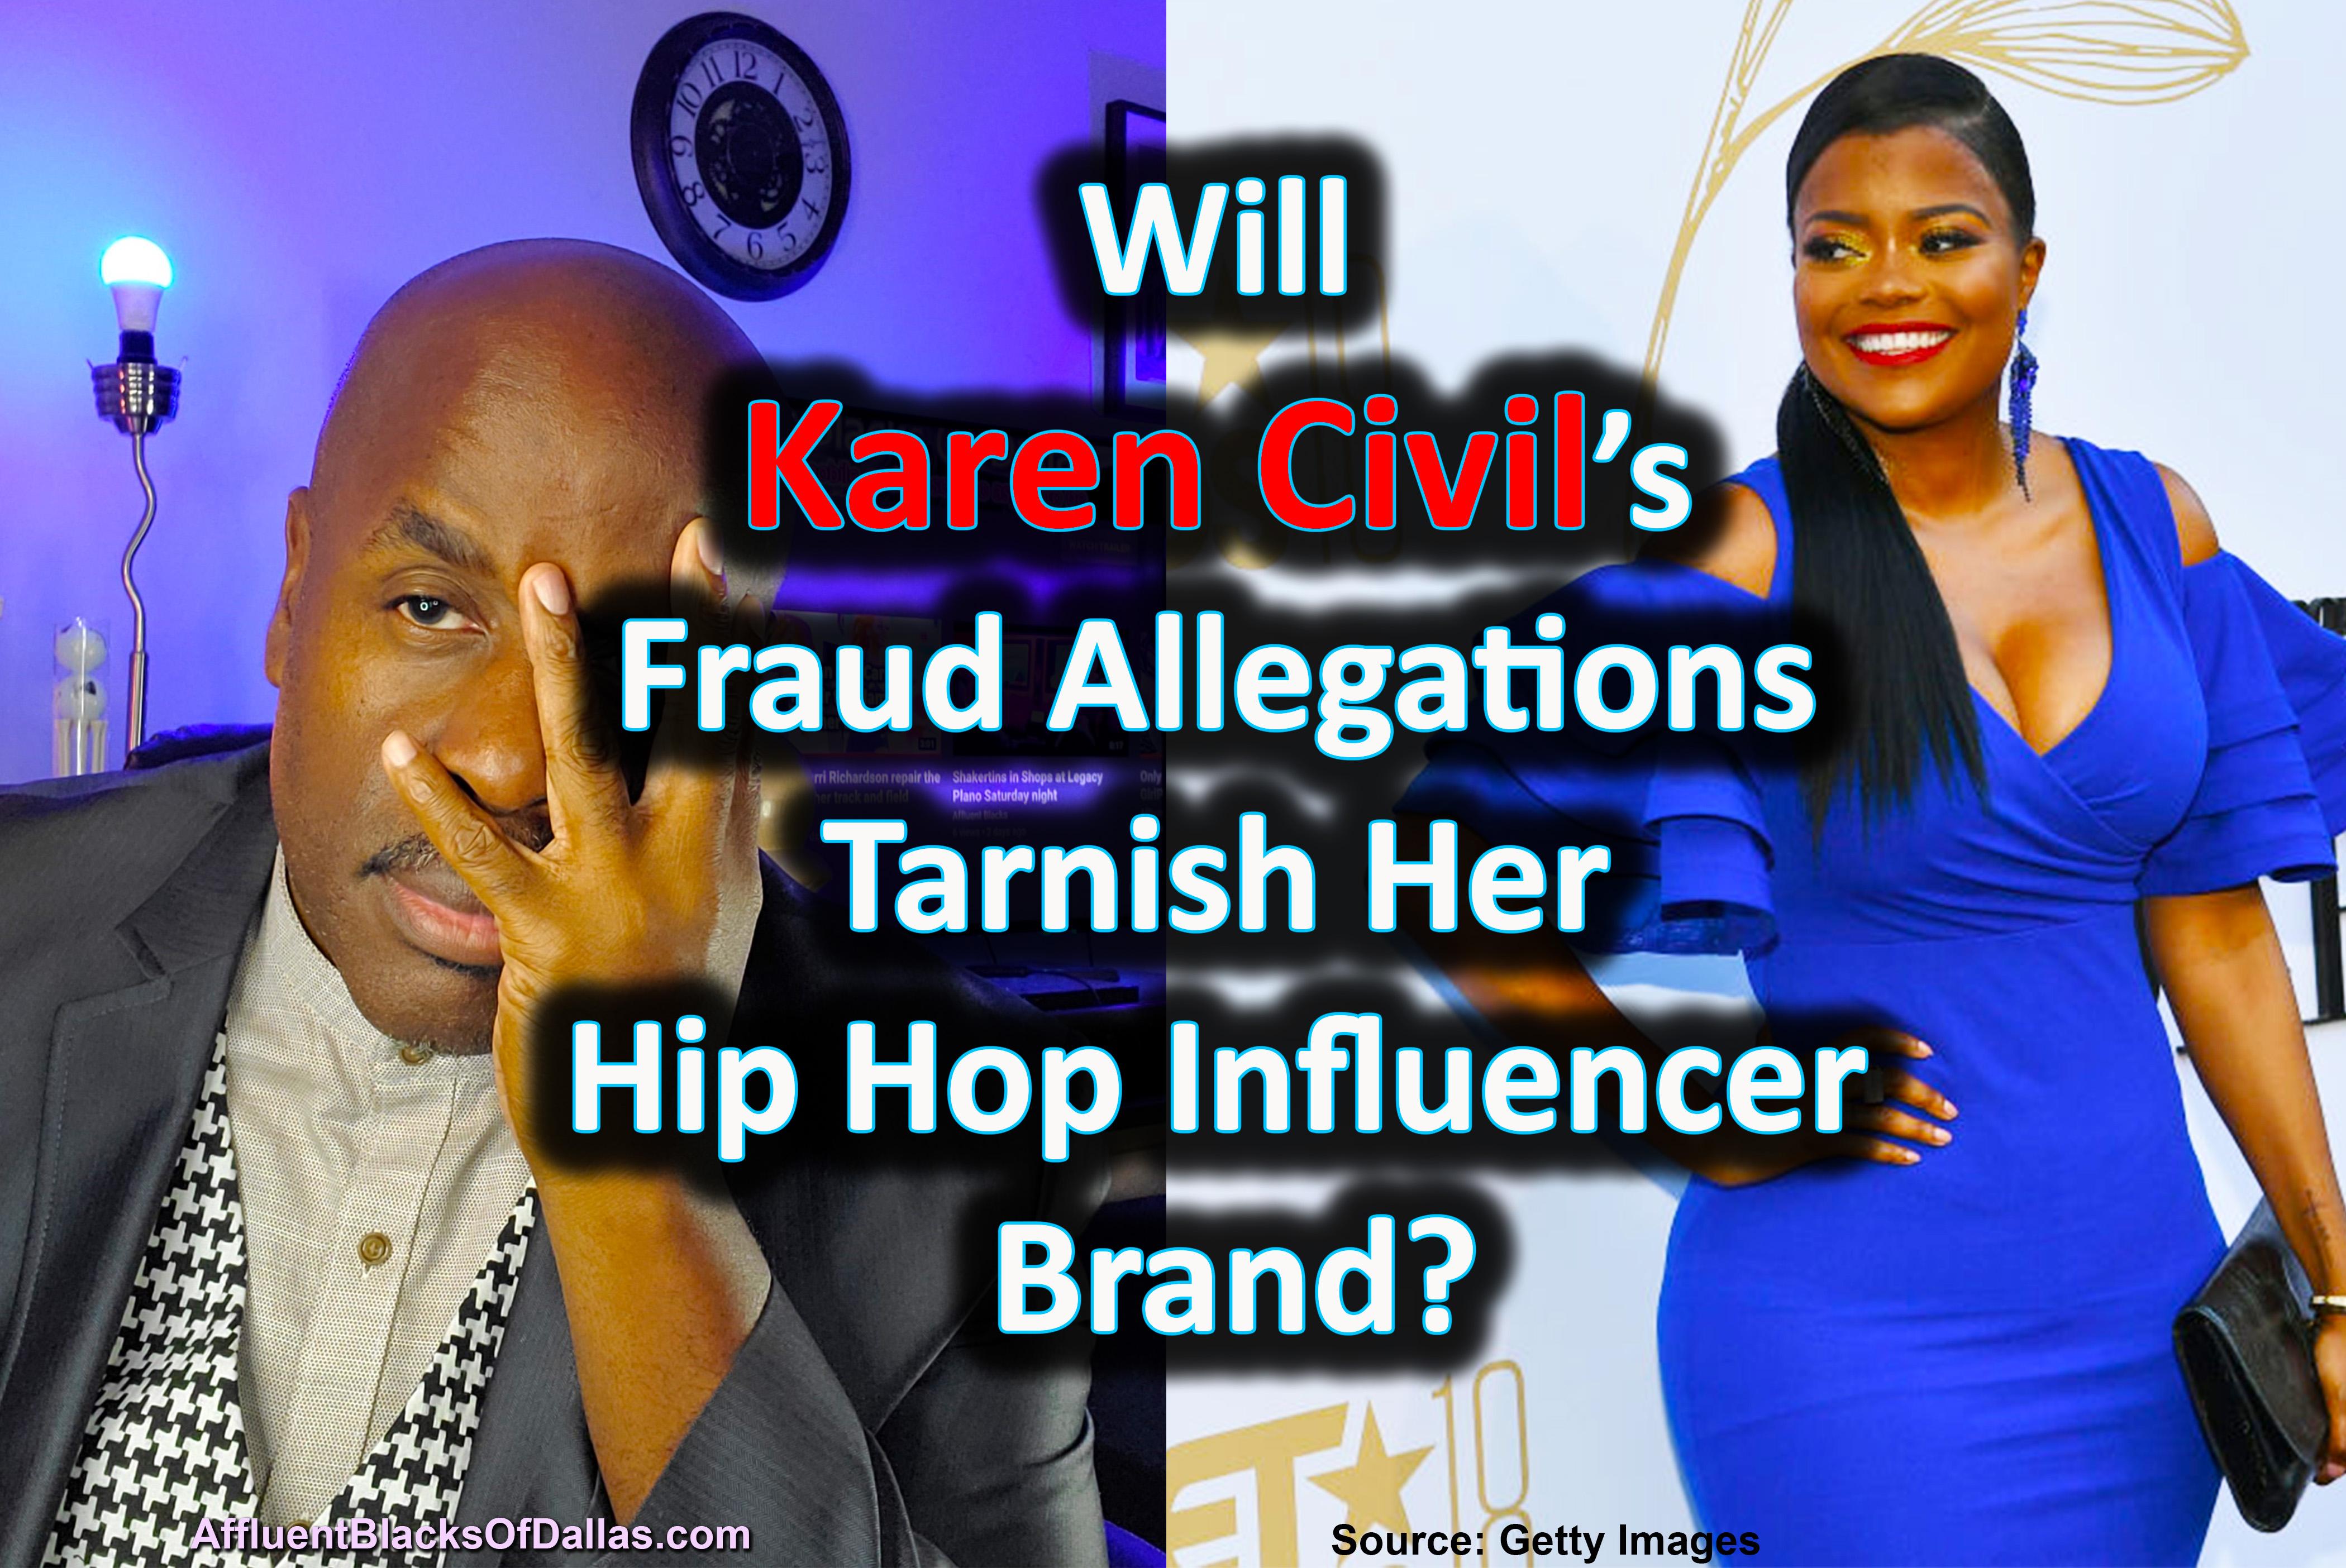 Will Karen Civil's Fraud Allegations Tarnish Her Media Influencer Brand? Lessons on PR Damage Control